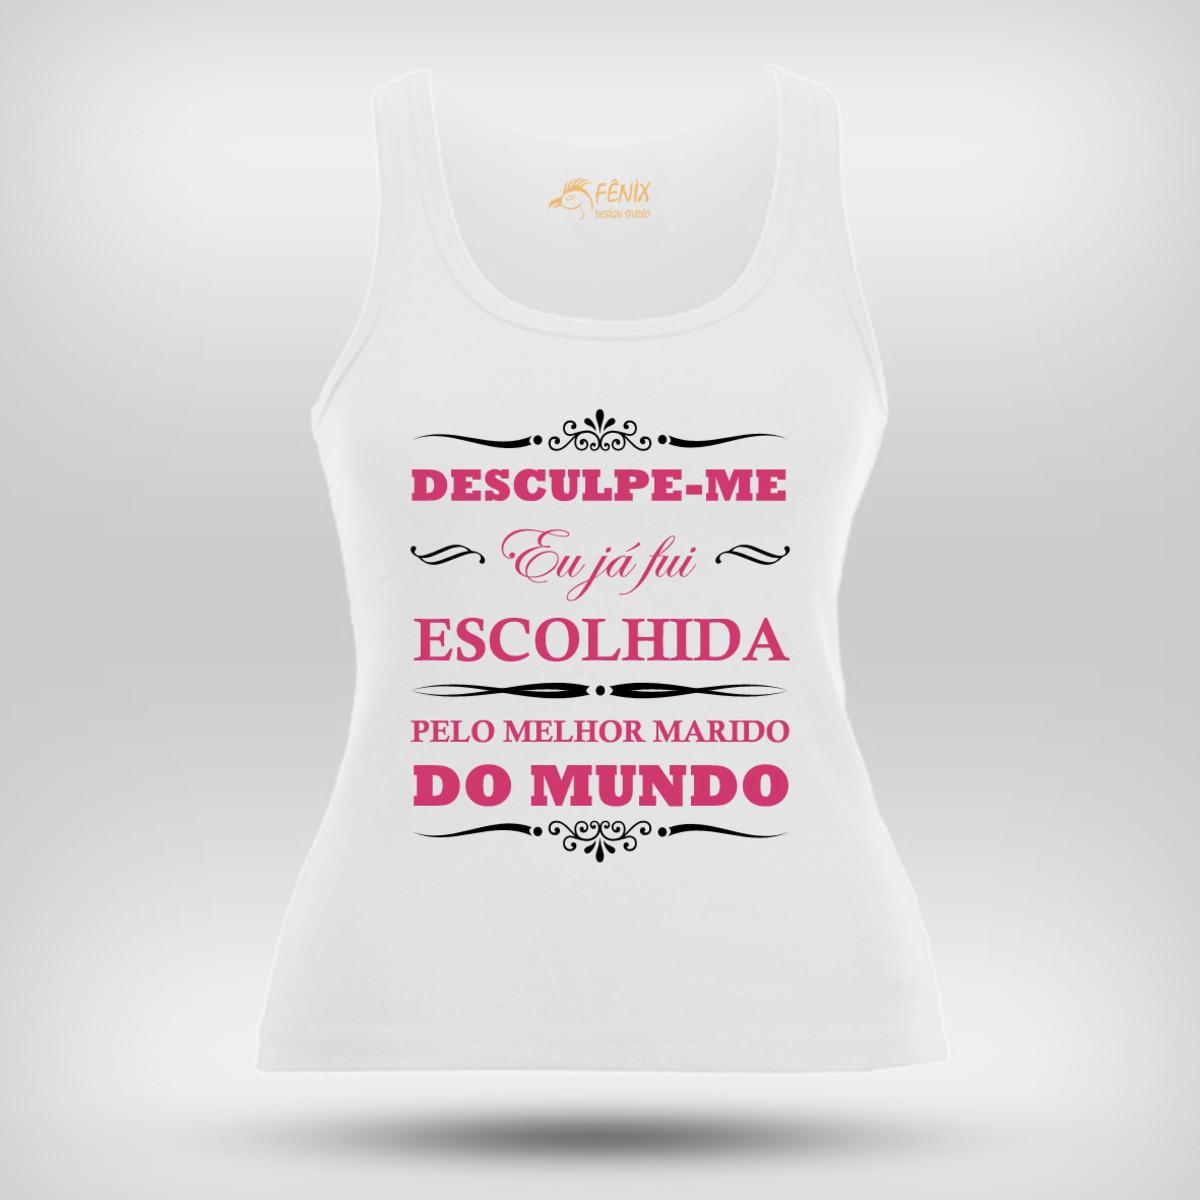 2815350e76 Regata Masculina ou Feminina Carnaval Personalizada no Elo7